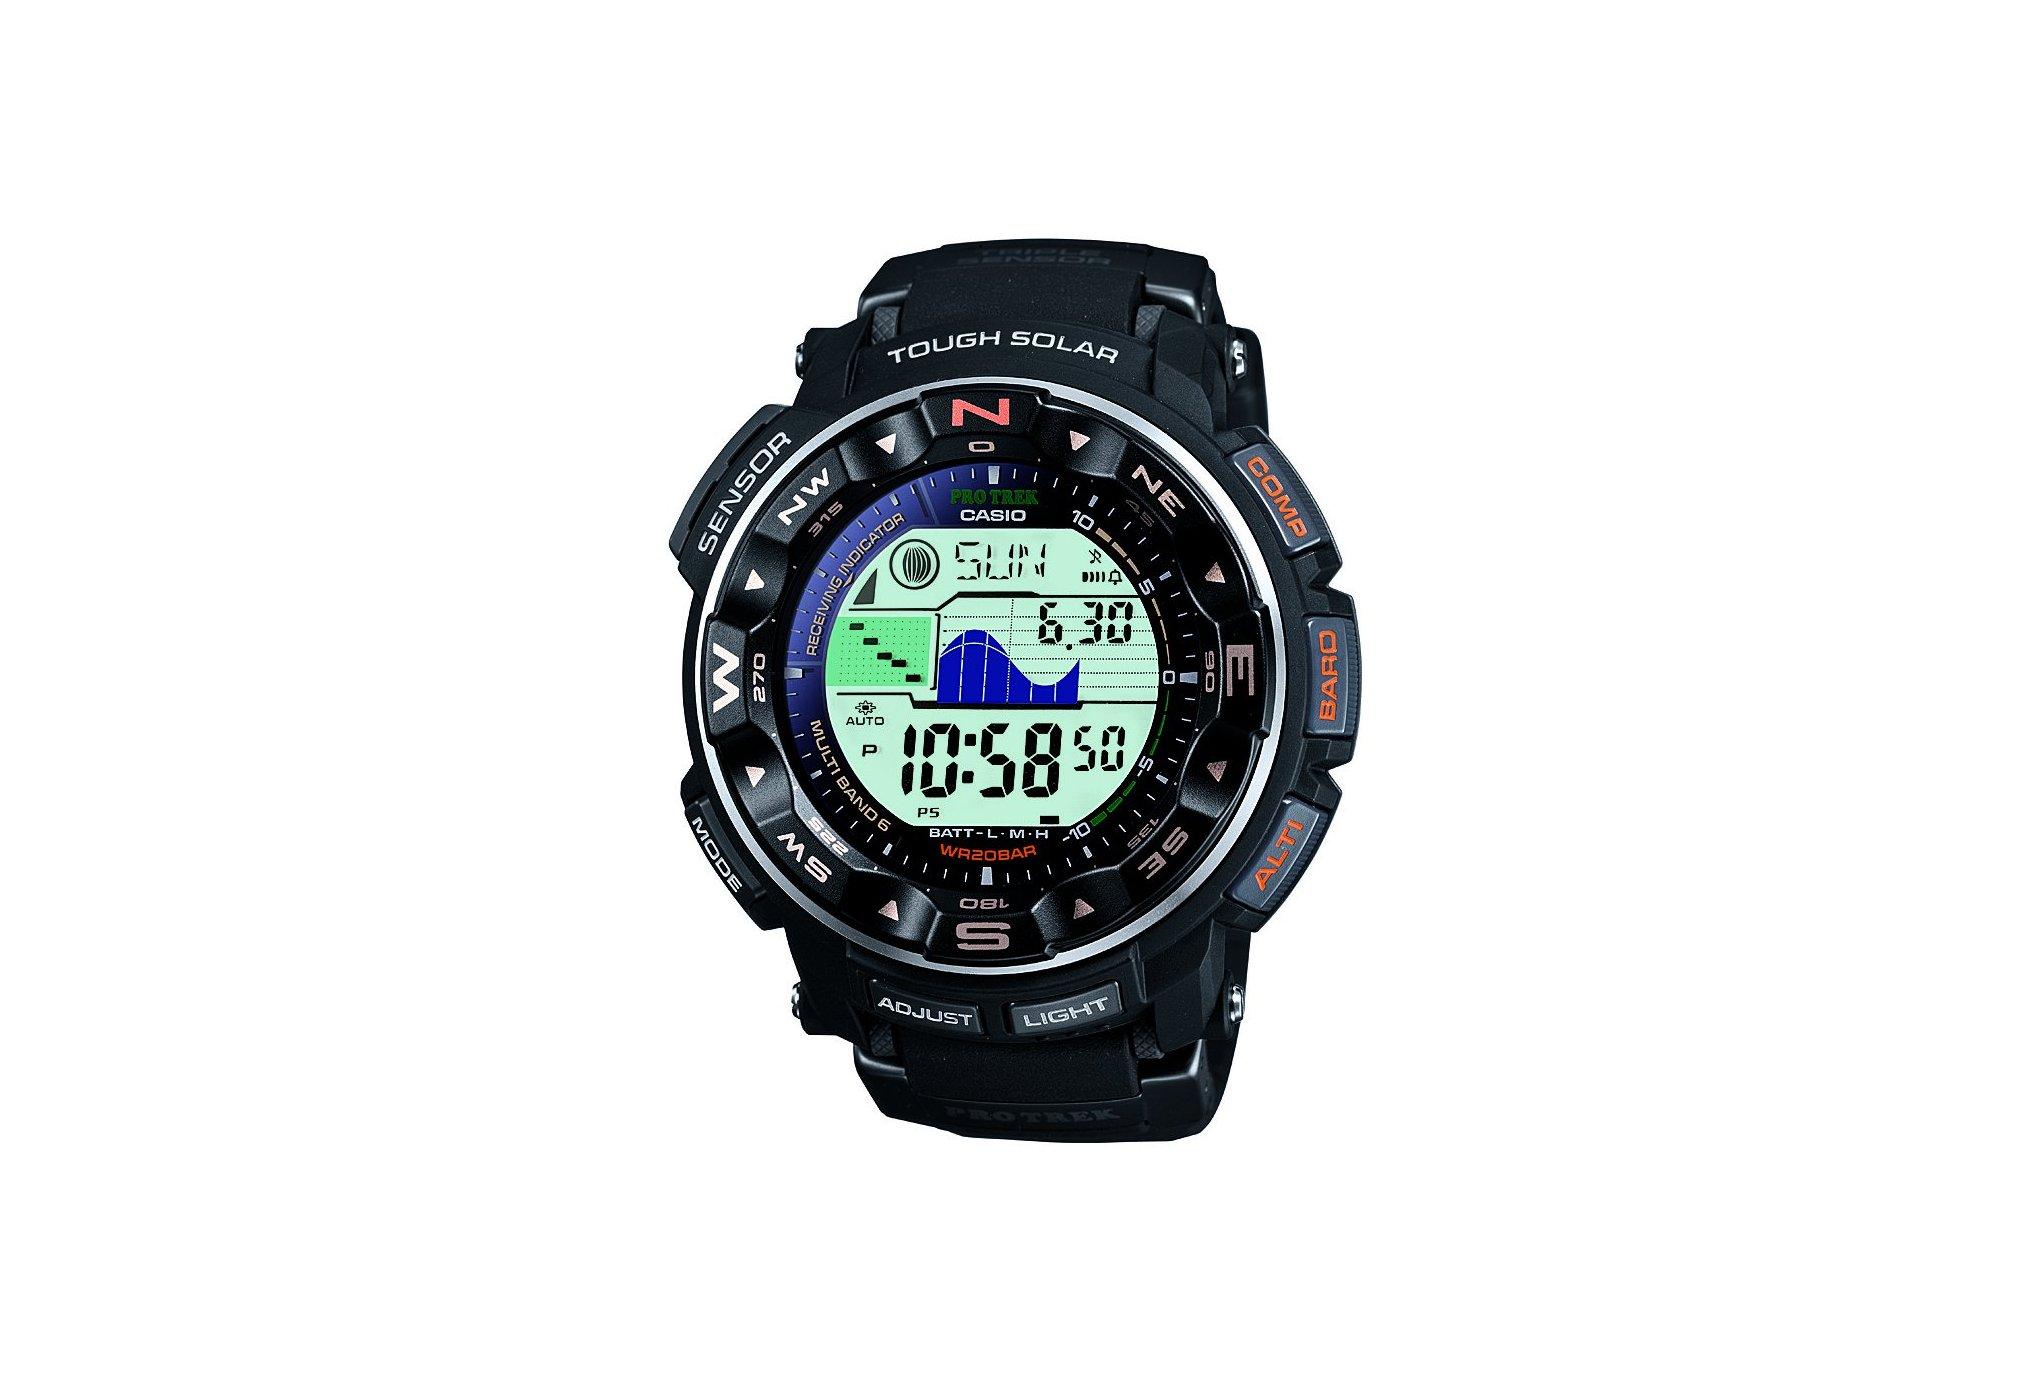 Casio Pro trek prw-2500 montres de sport